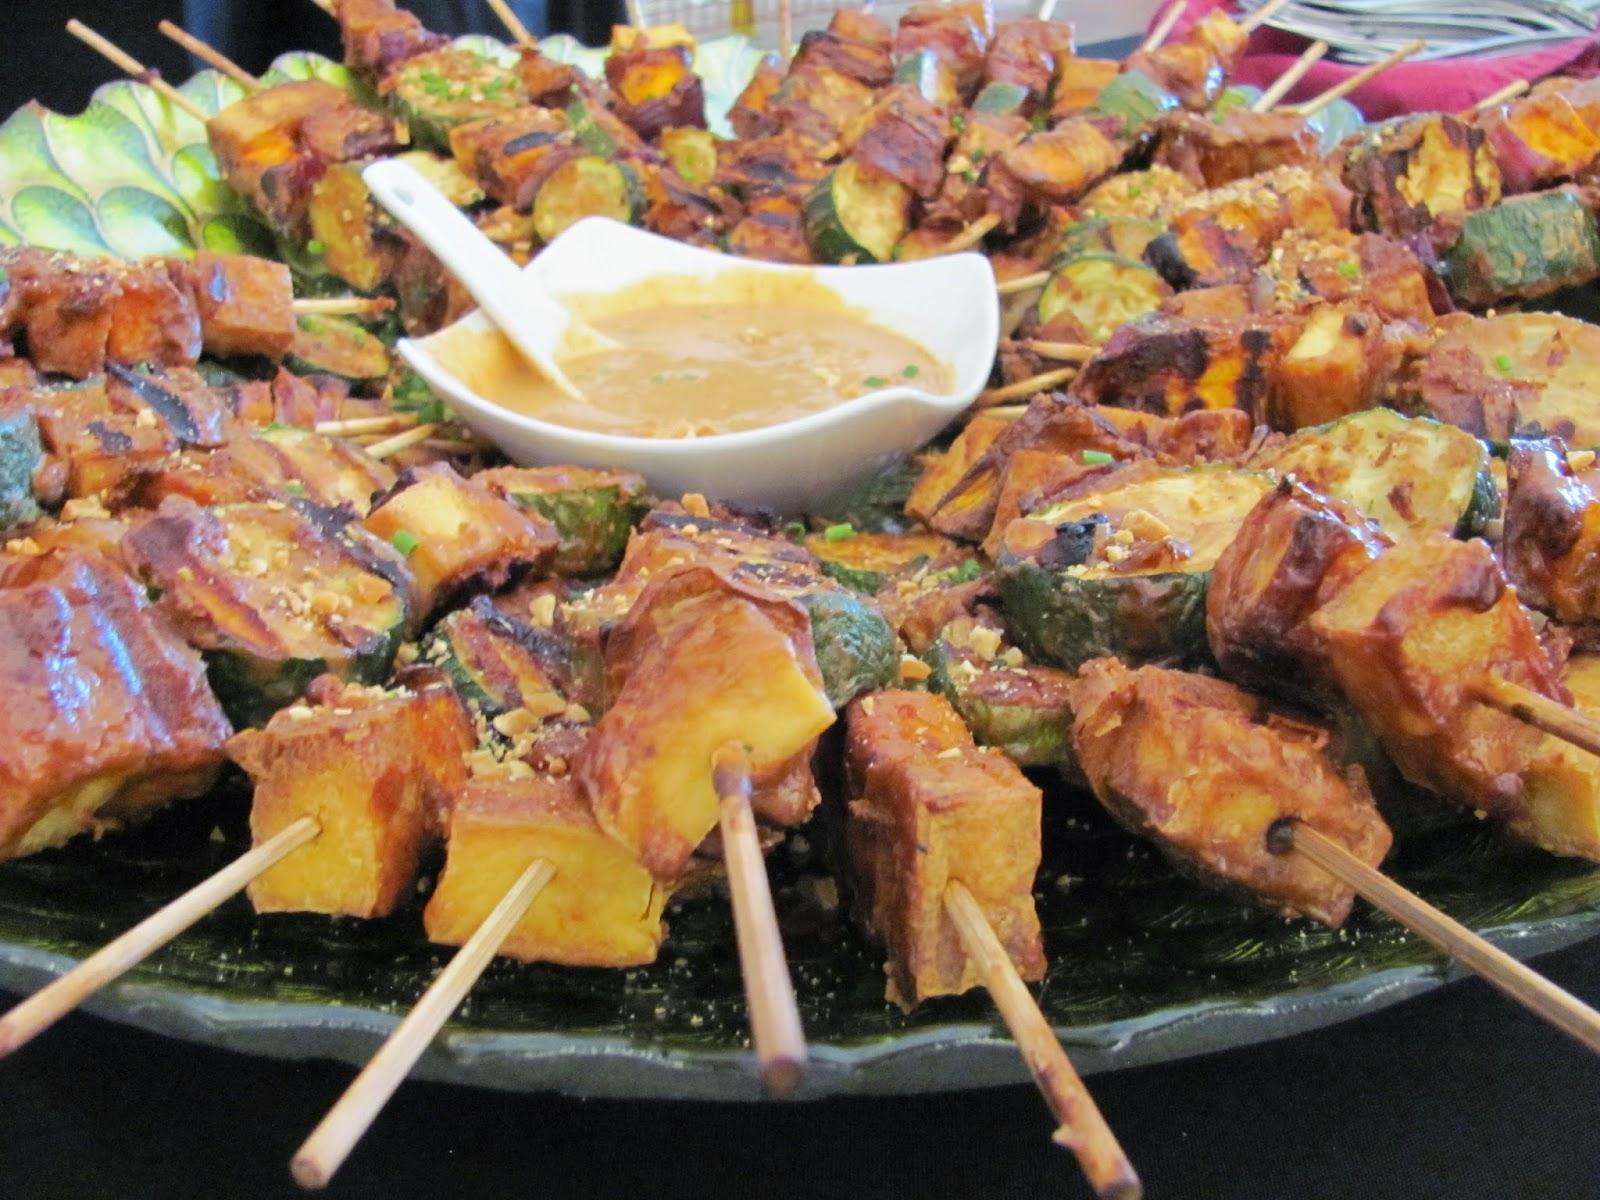 Gluten free vegan vegetarian catering denver